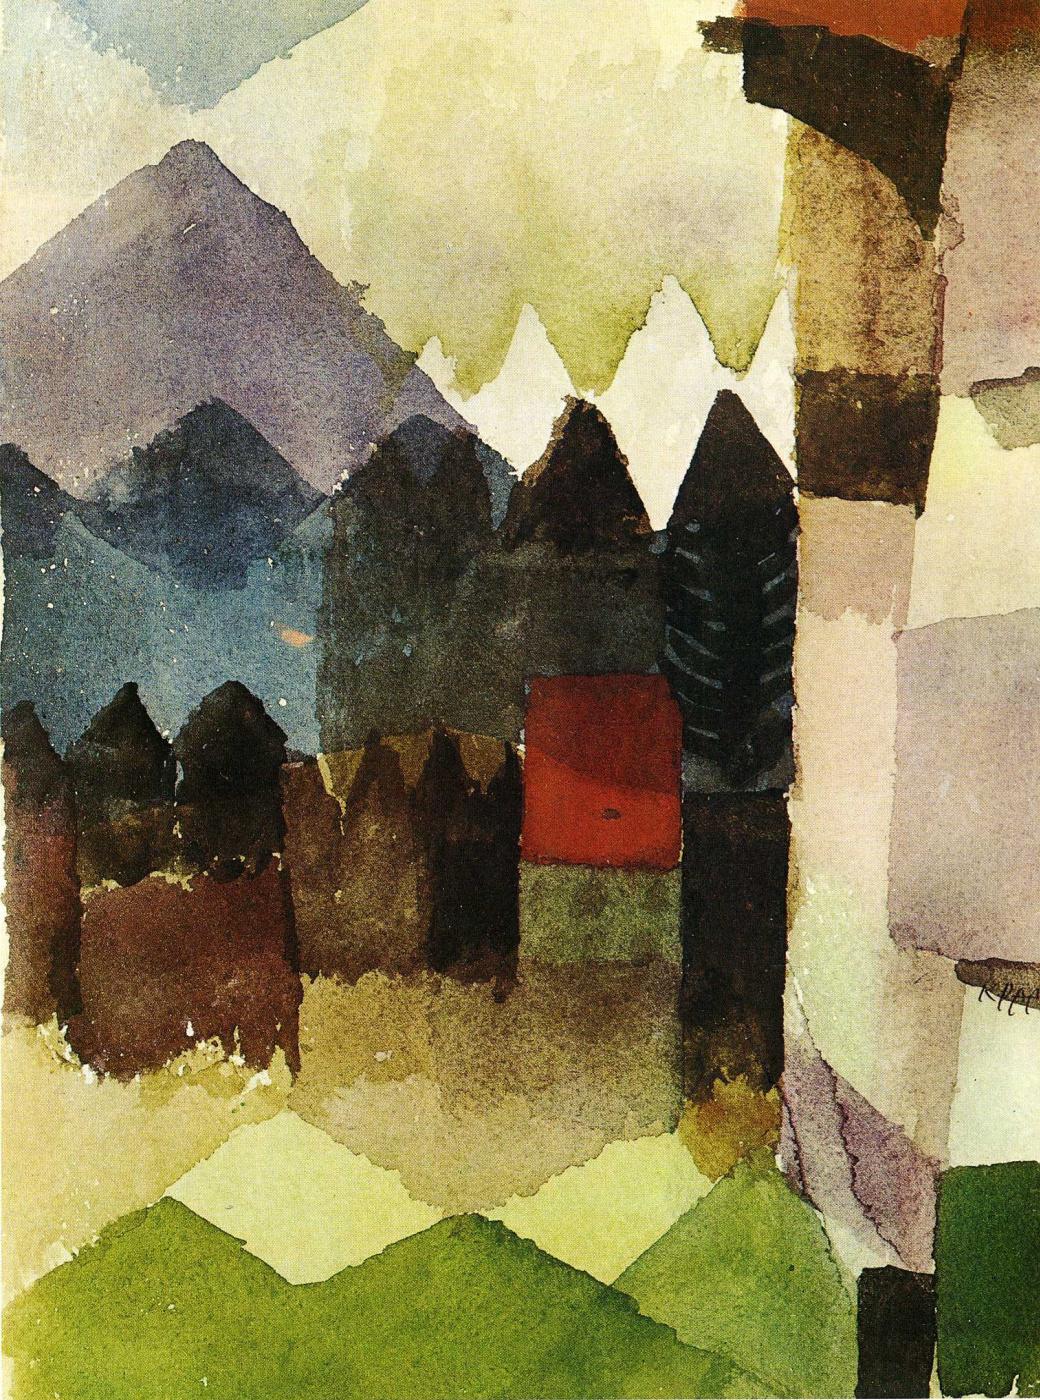 Paul Klee. The wind in the garden